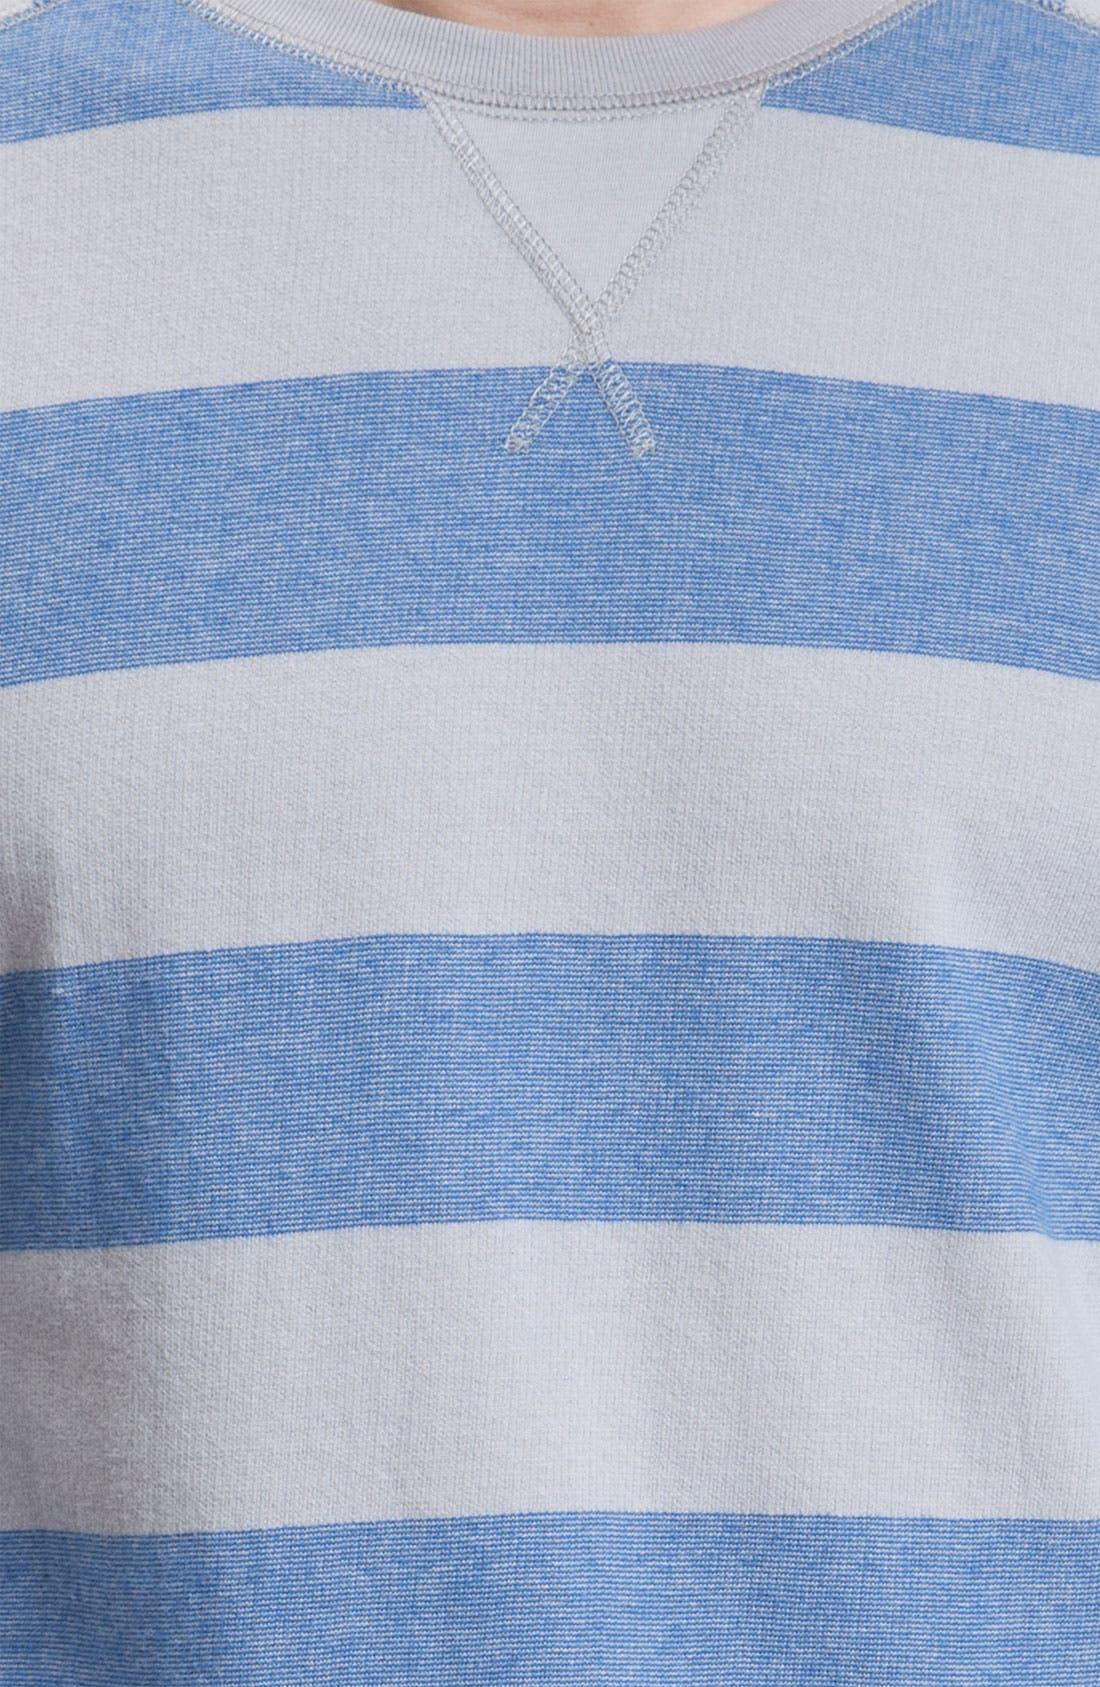 Alternate Image 3  - Quiksilver Long Sleeve Crewneck Shirt